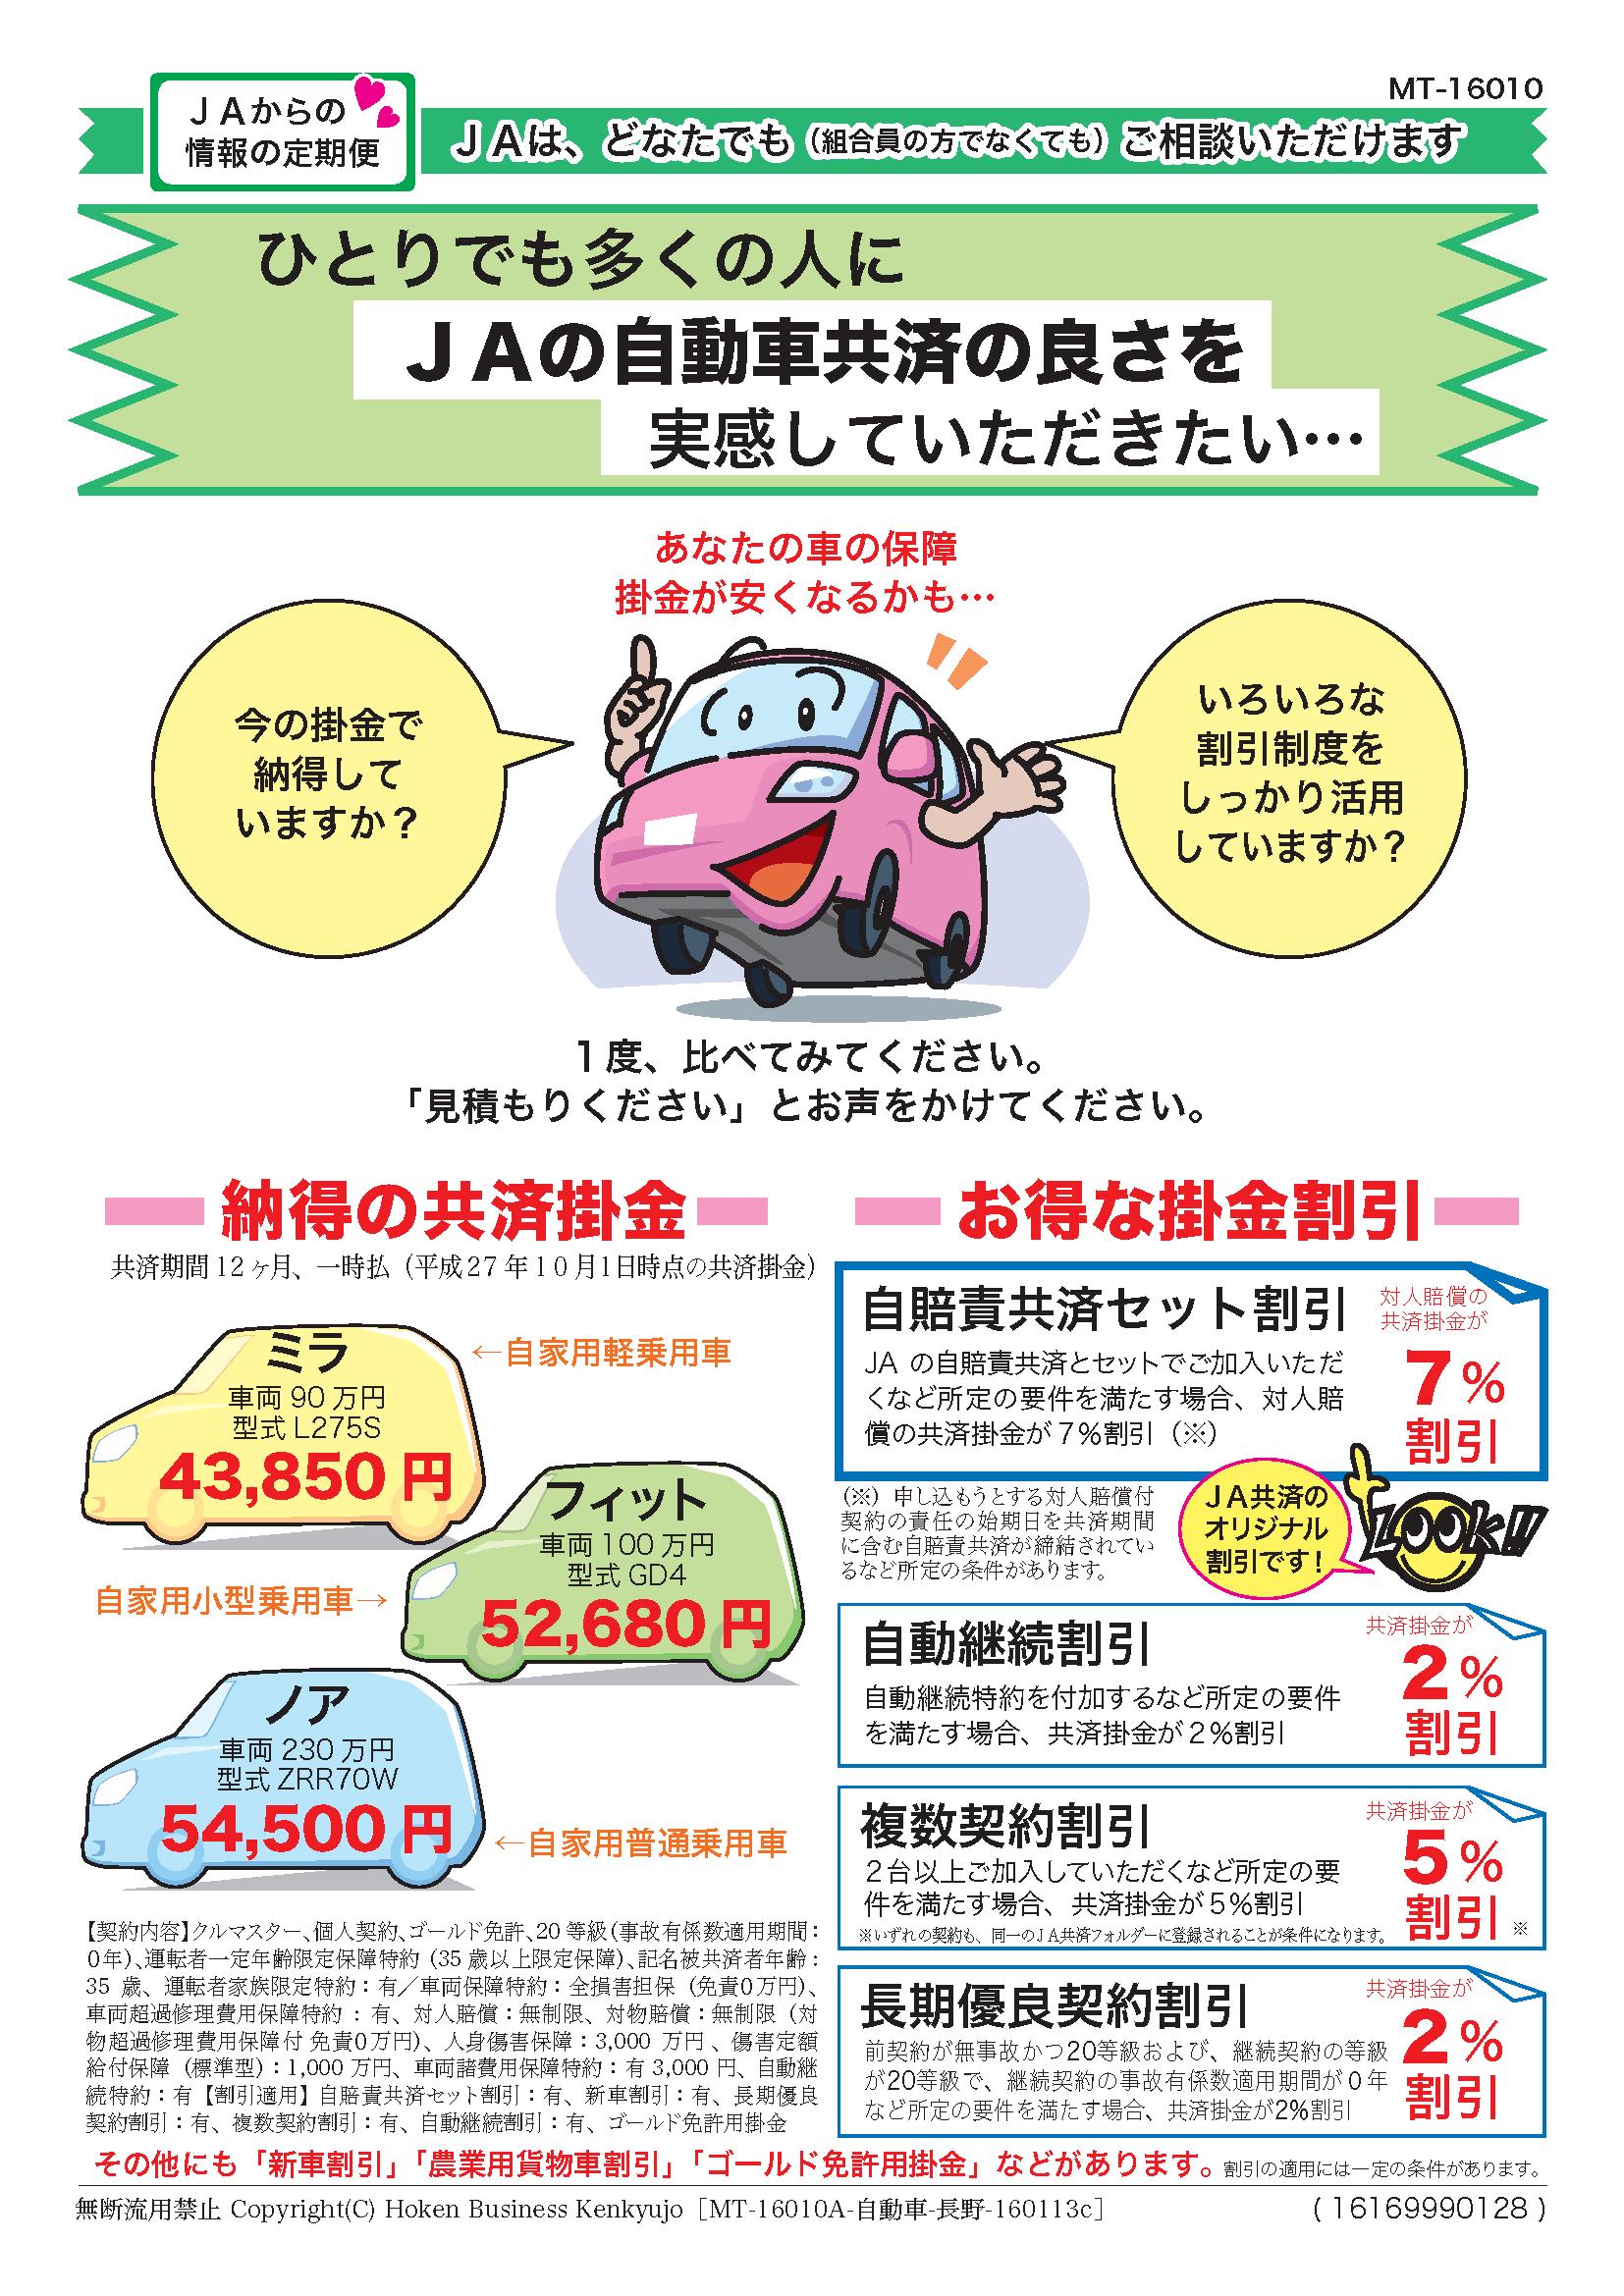 MT-16010-自動車_ページ_1.png